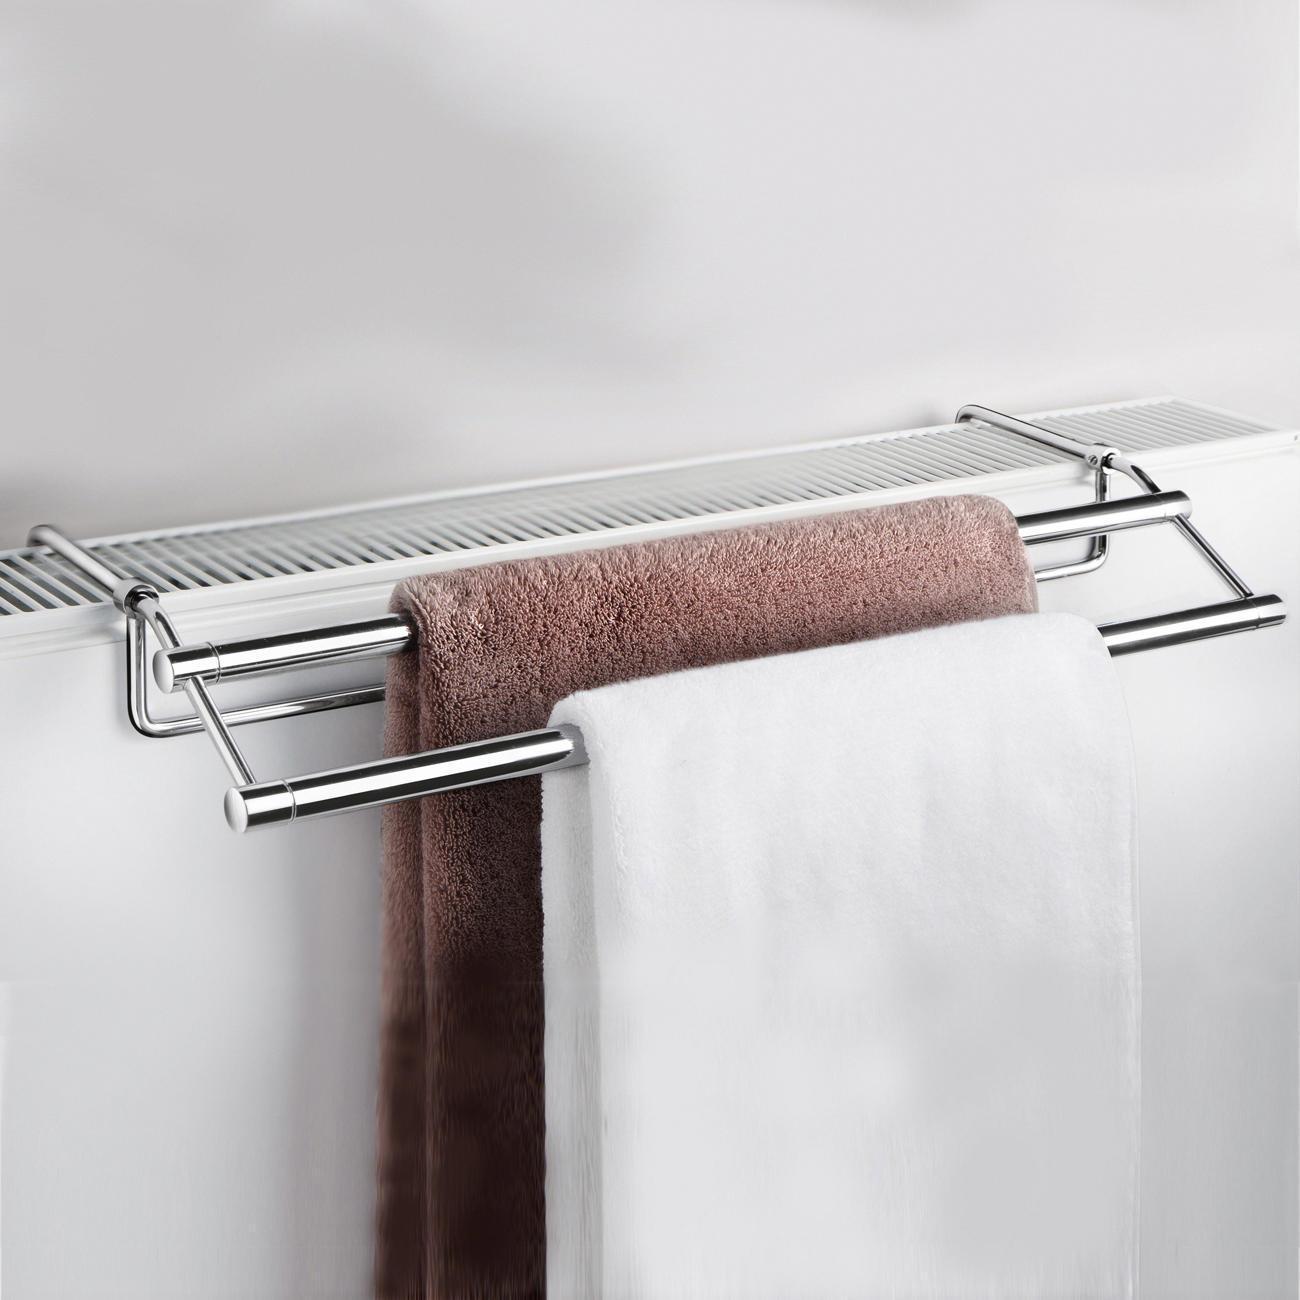 handtuchtrockner f r heizk rper mit 3 jahren garantie. Black Bedroom Furniture Sets. Home Design Ideas